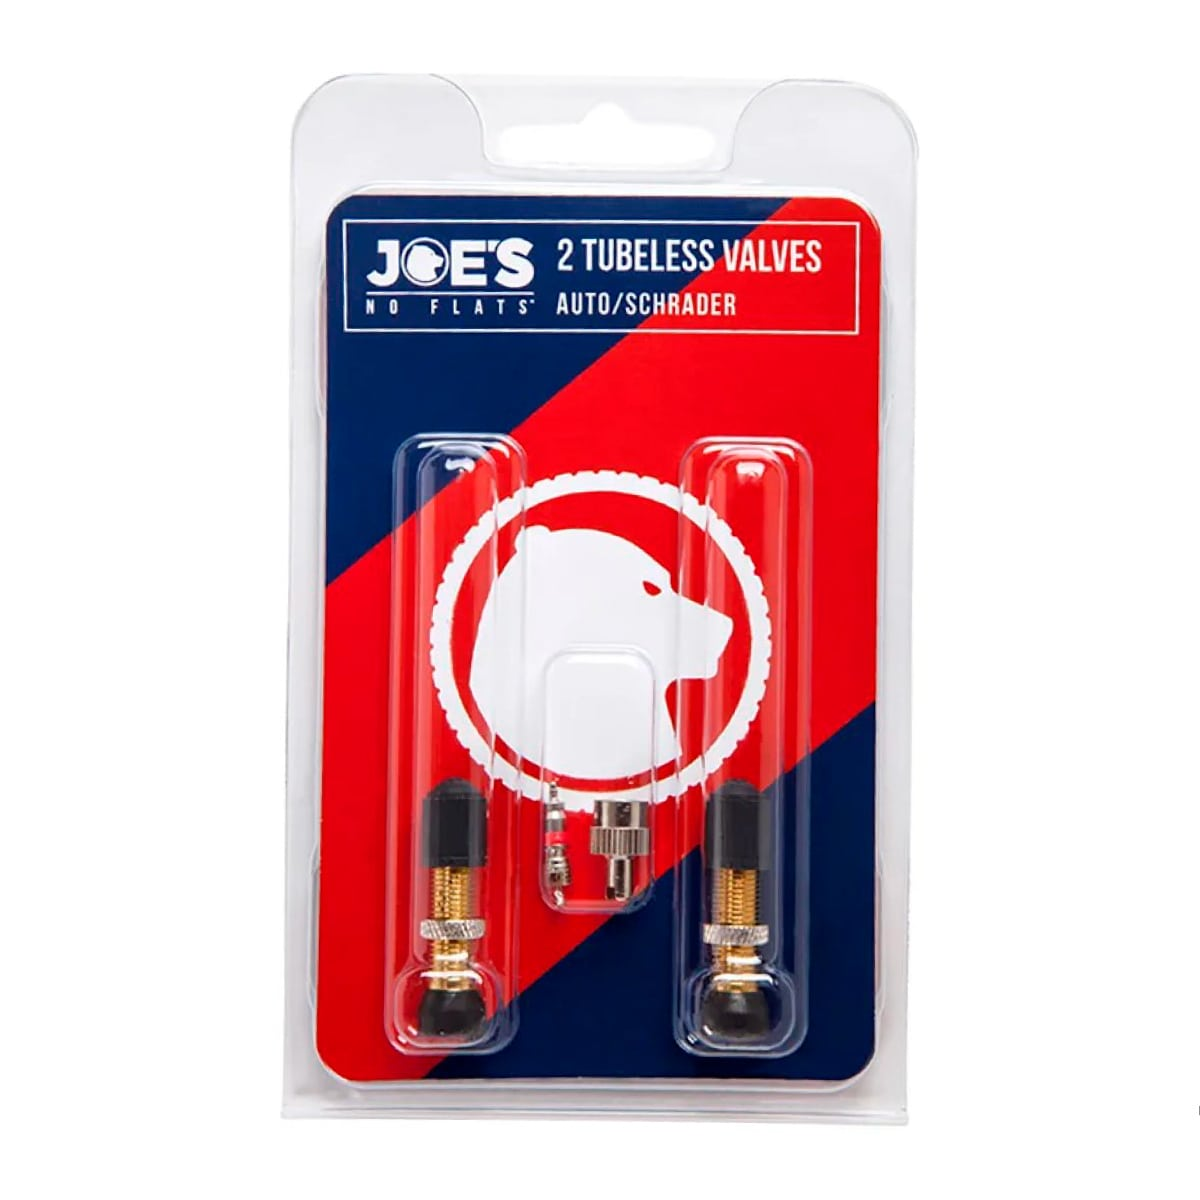 Valvula Tubeless Joes No Flats Aluminio Preto 36mm